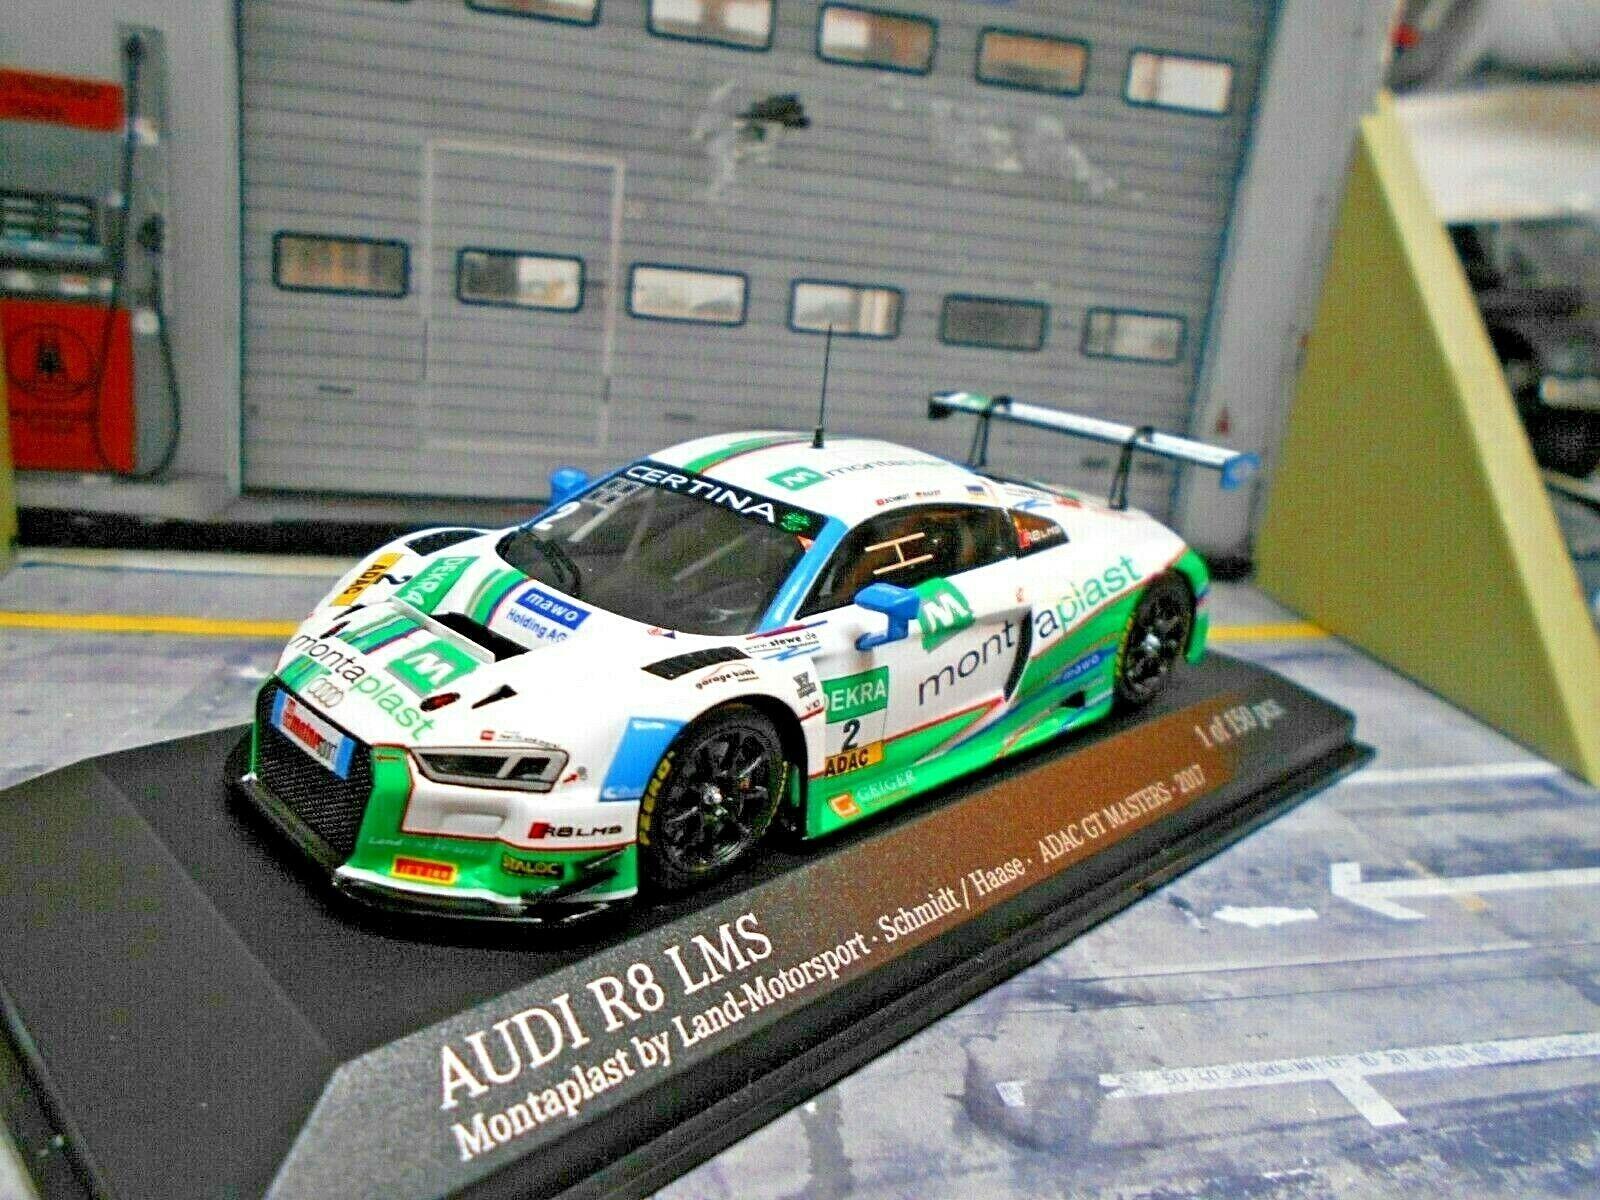 AUDI r8 LMS gt3 ADAC GT Masters 2017  2 paese montaplast Haase Minichamps 1 43